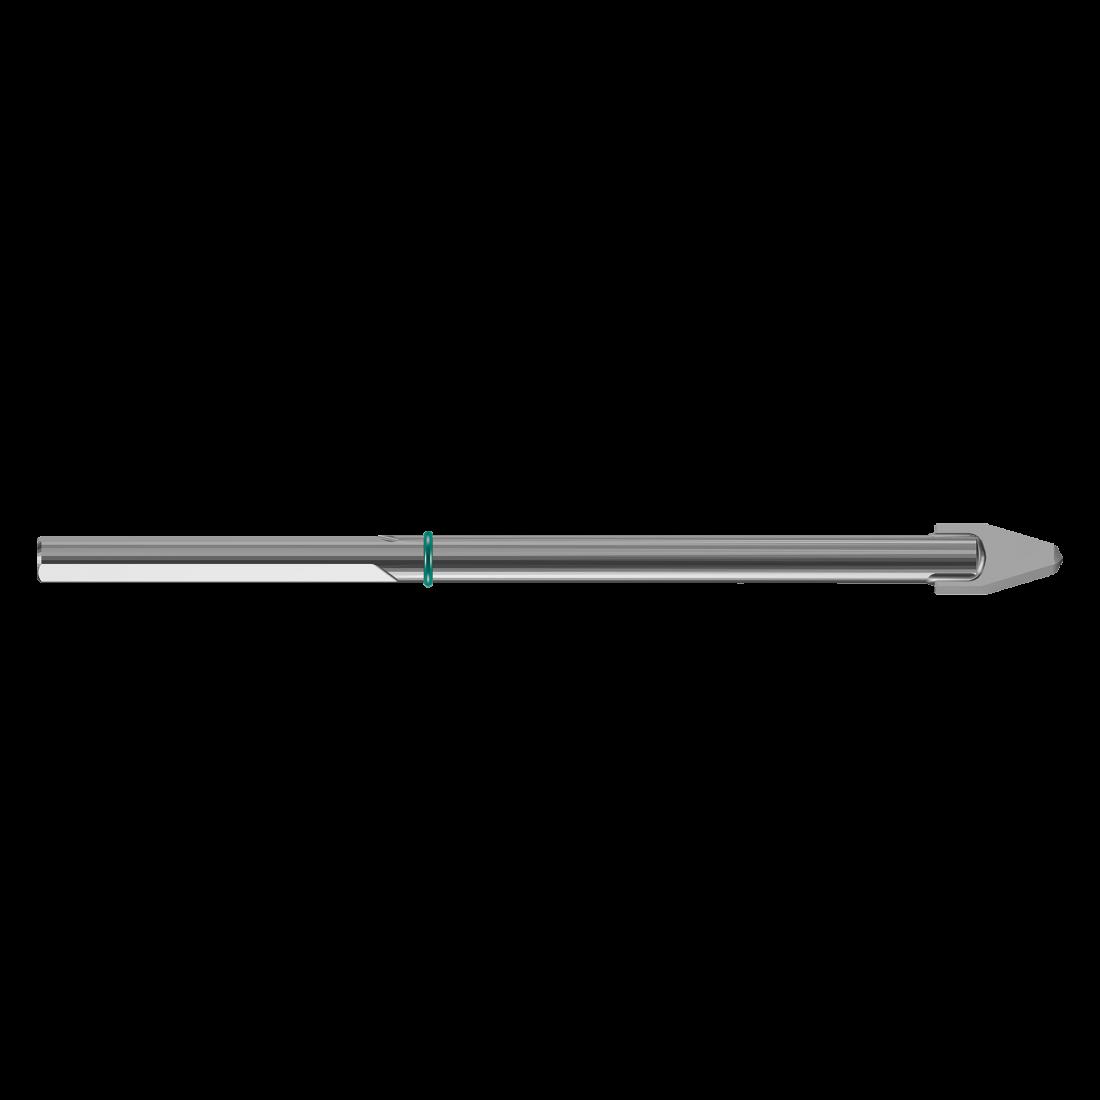 Сверло по керамограниту Heller CeraExpert 10х125мм